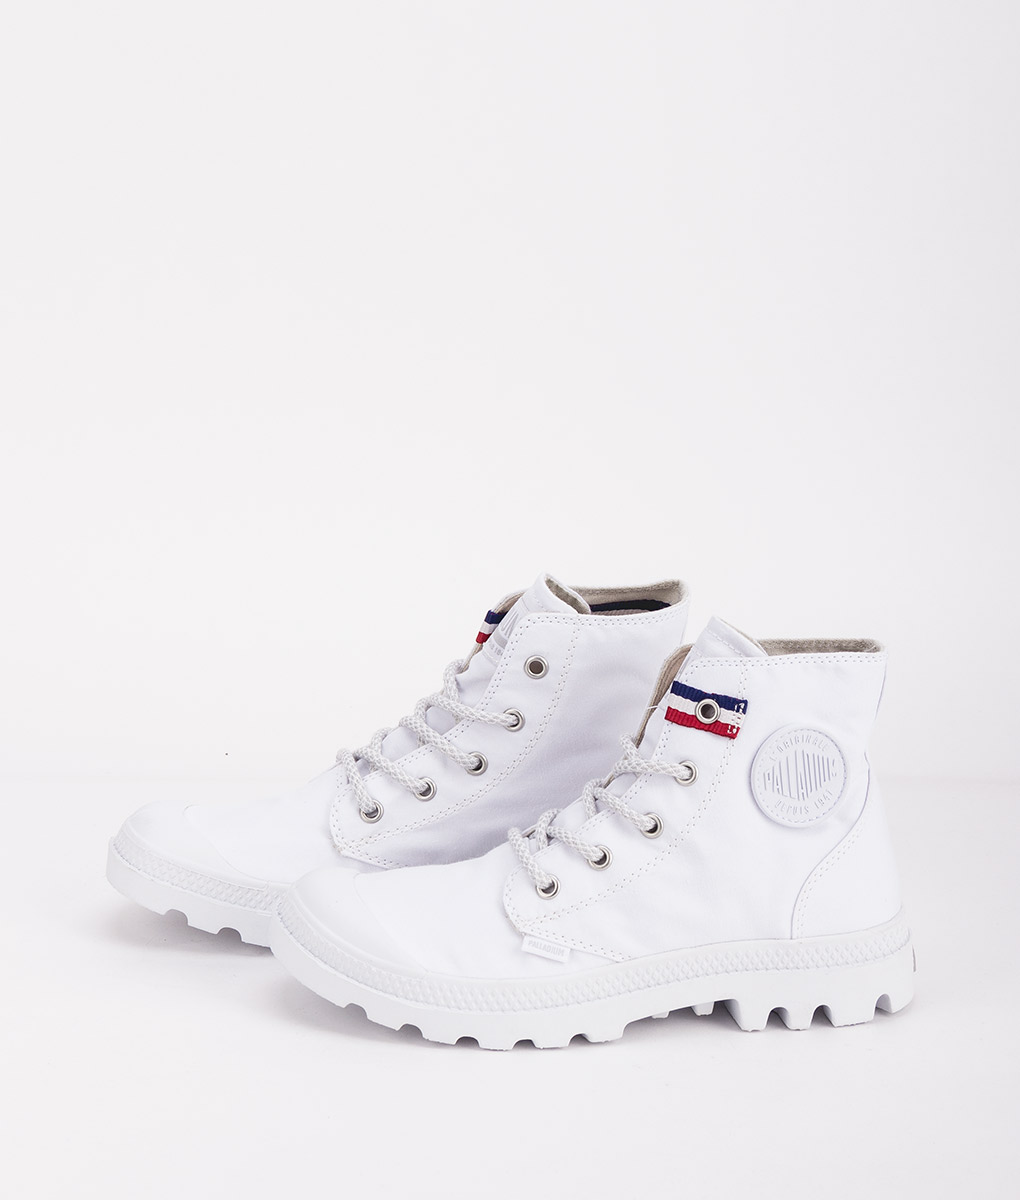 PALLADIUM Unisex Sneakers 75753 PAMPA HI RIVE, White French Tape 79.99